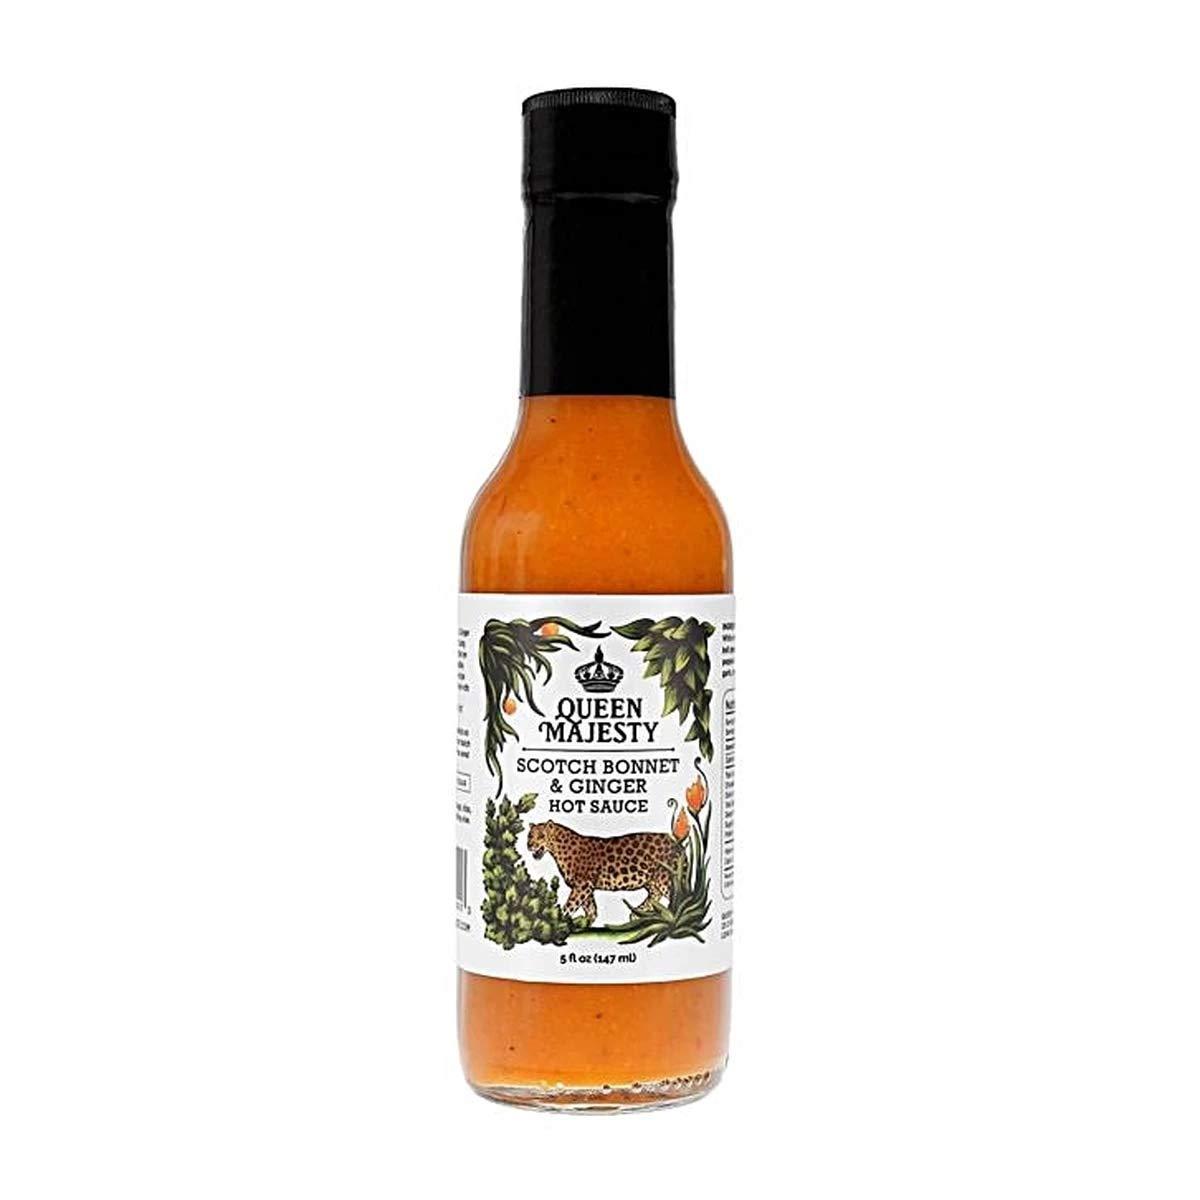 QUEEN MAJESTY HOT Max Special sale item 74% OFF SAUCE Hot Sauce FZ Ginger 5 Scotch Bonnet